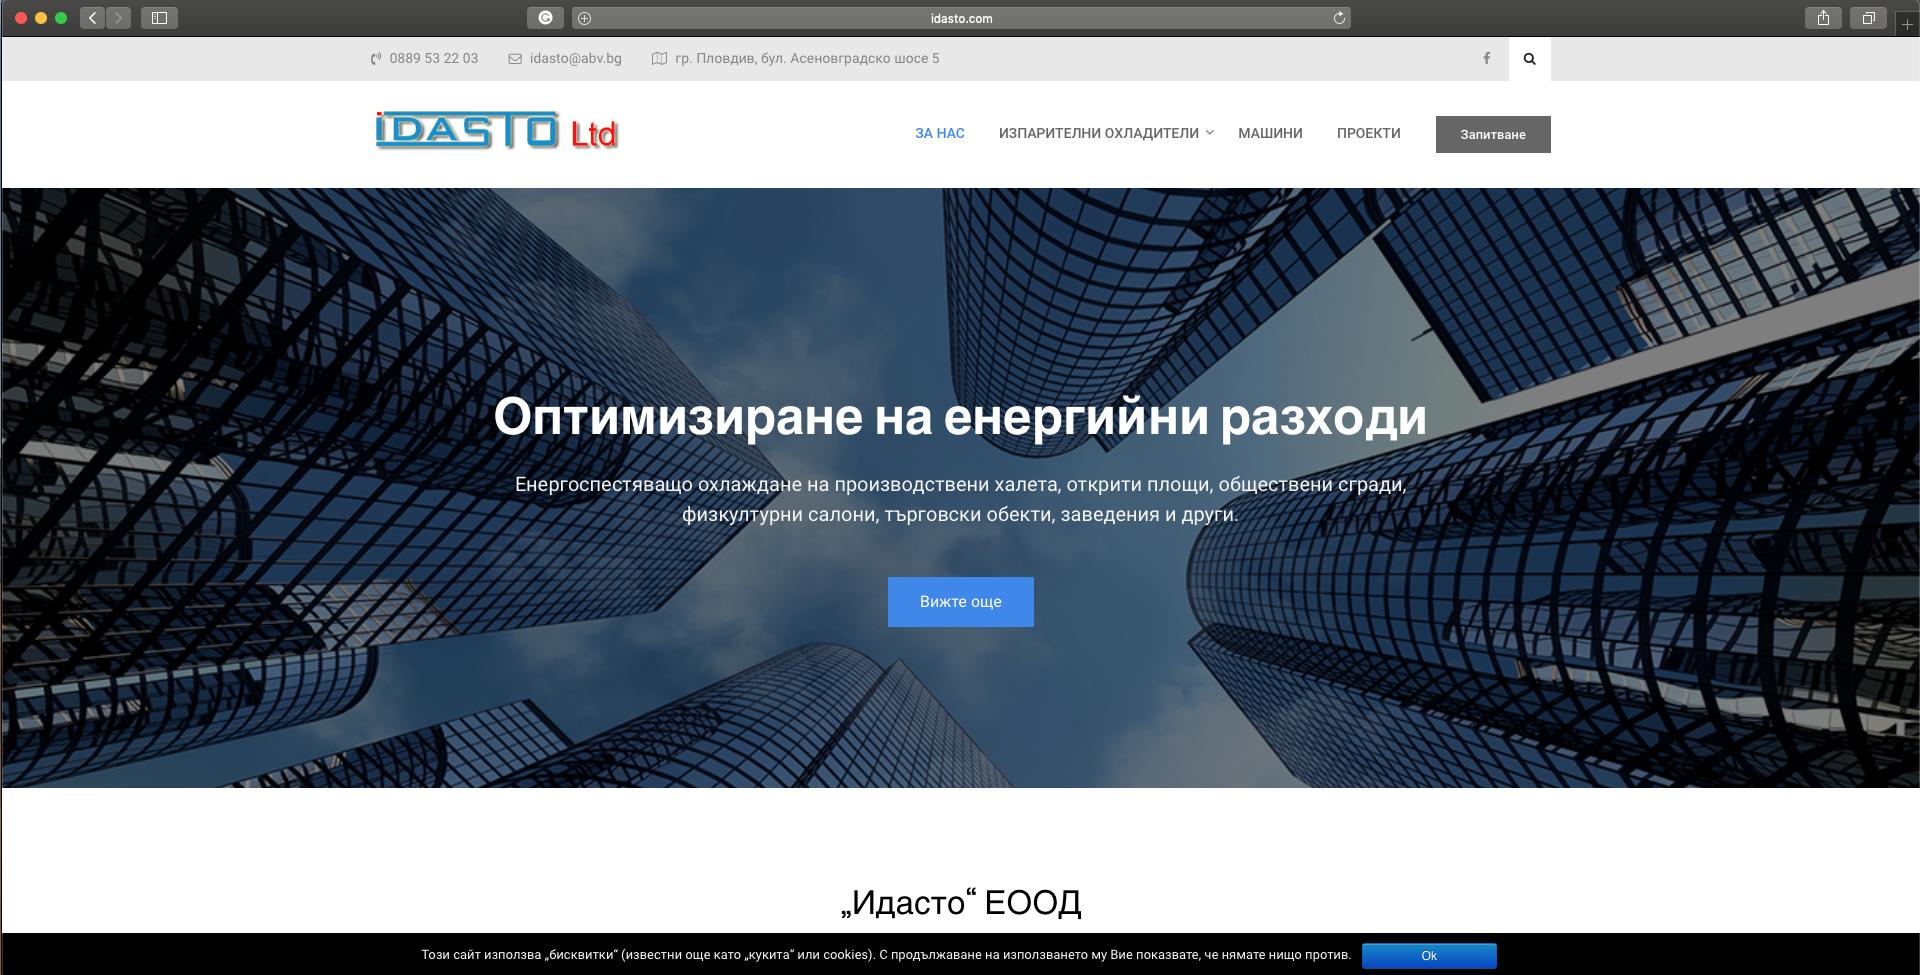 idasto.com